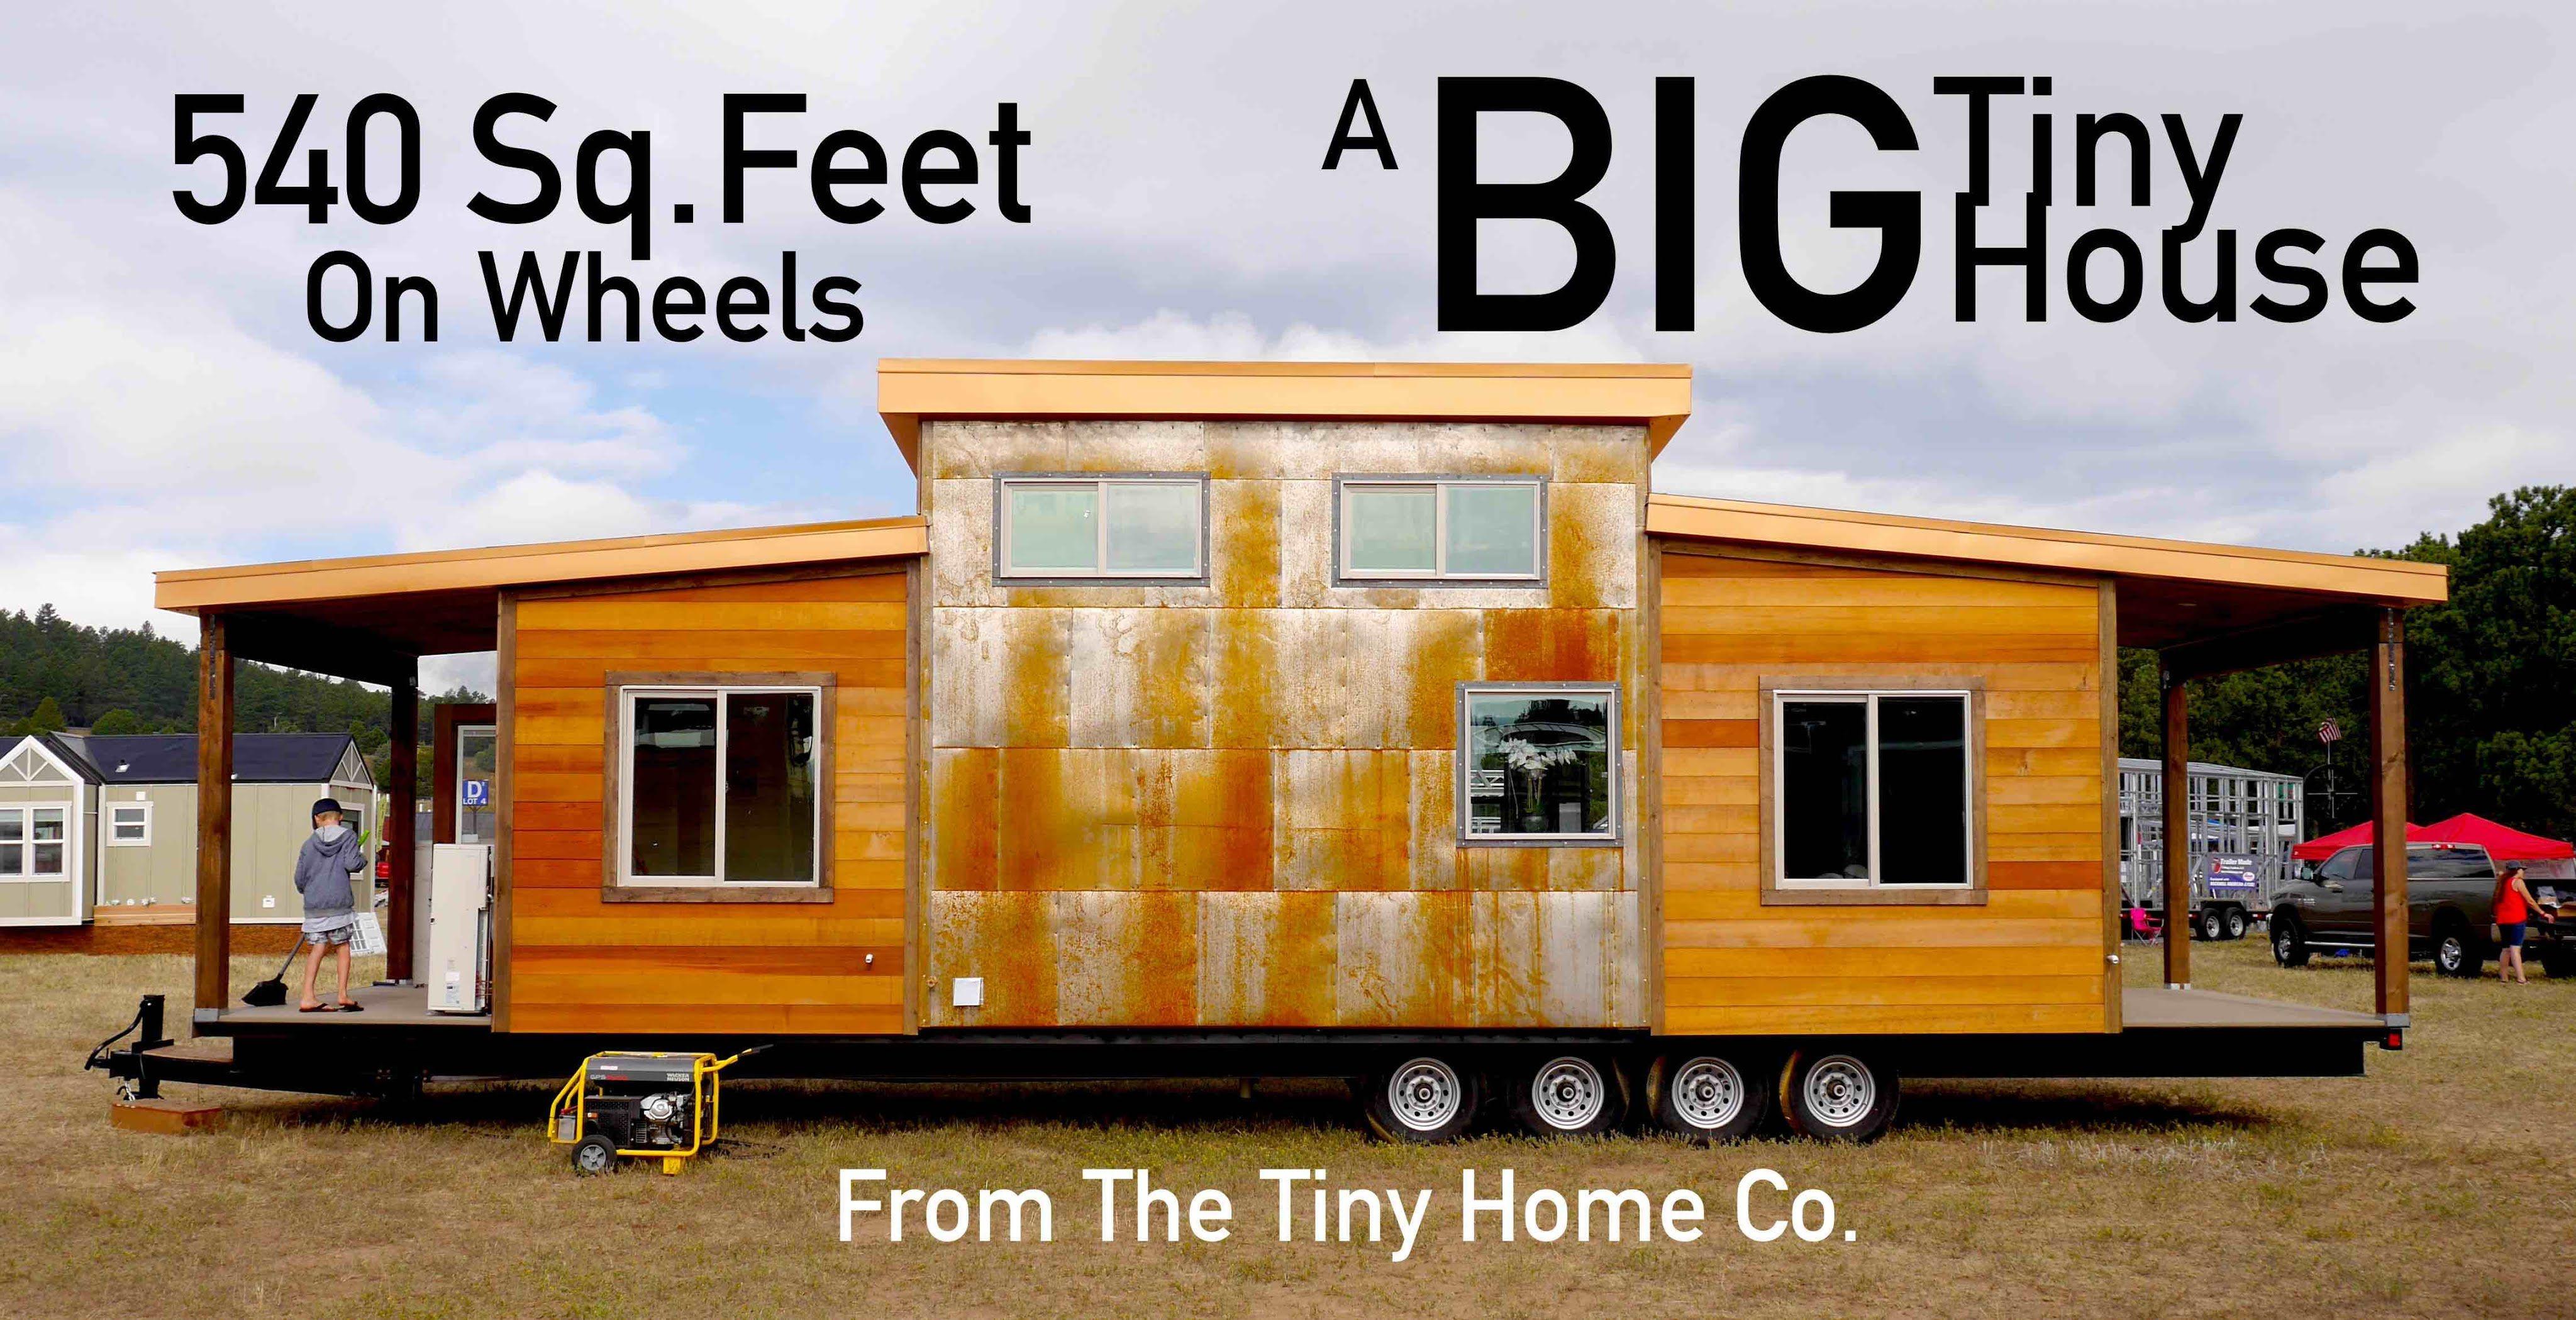 The Big Tiny House 540 Square Feet Four Axles Tiny House